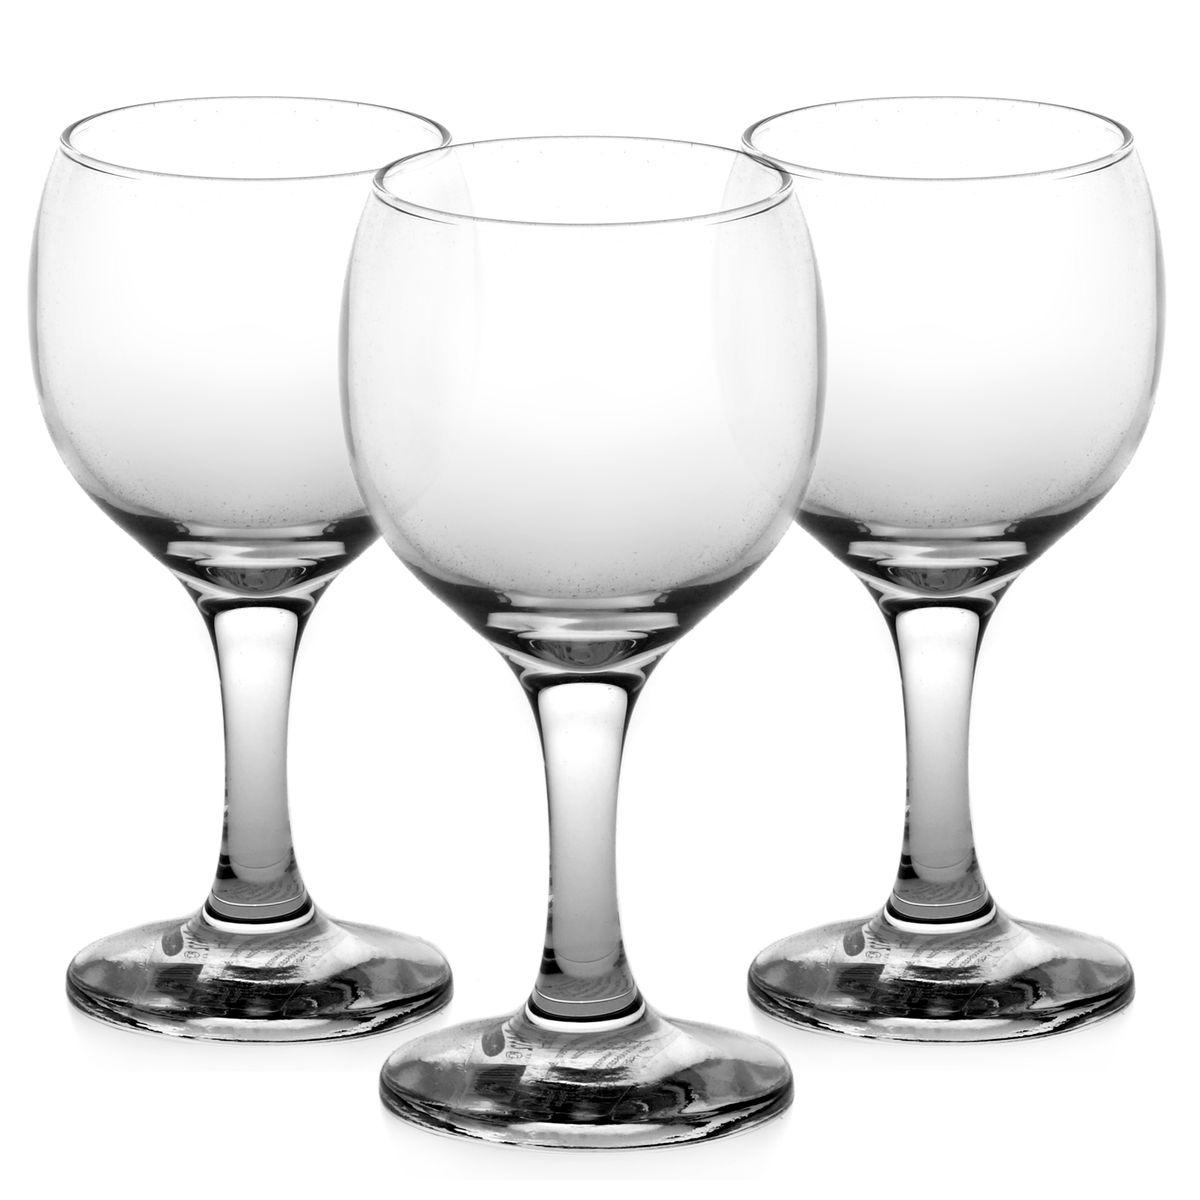 Фото - Набор бокалов для белого вина Pasabahce Bistro, 175 мл, 3 шт набор бокалов для мартини pasabahce bistro 170 мл